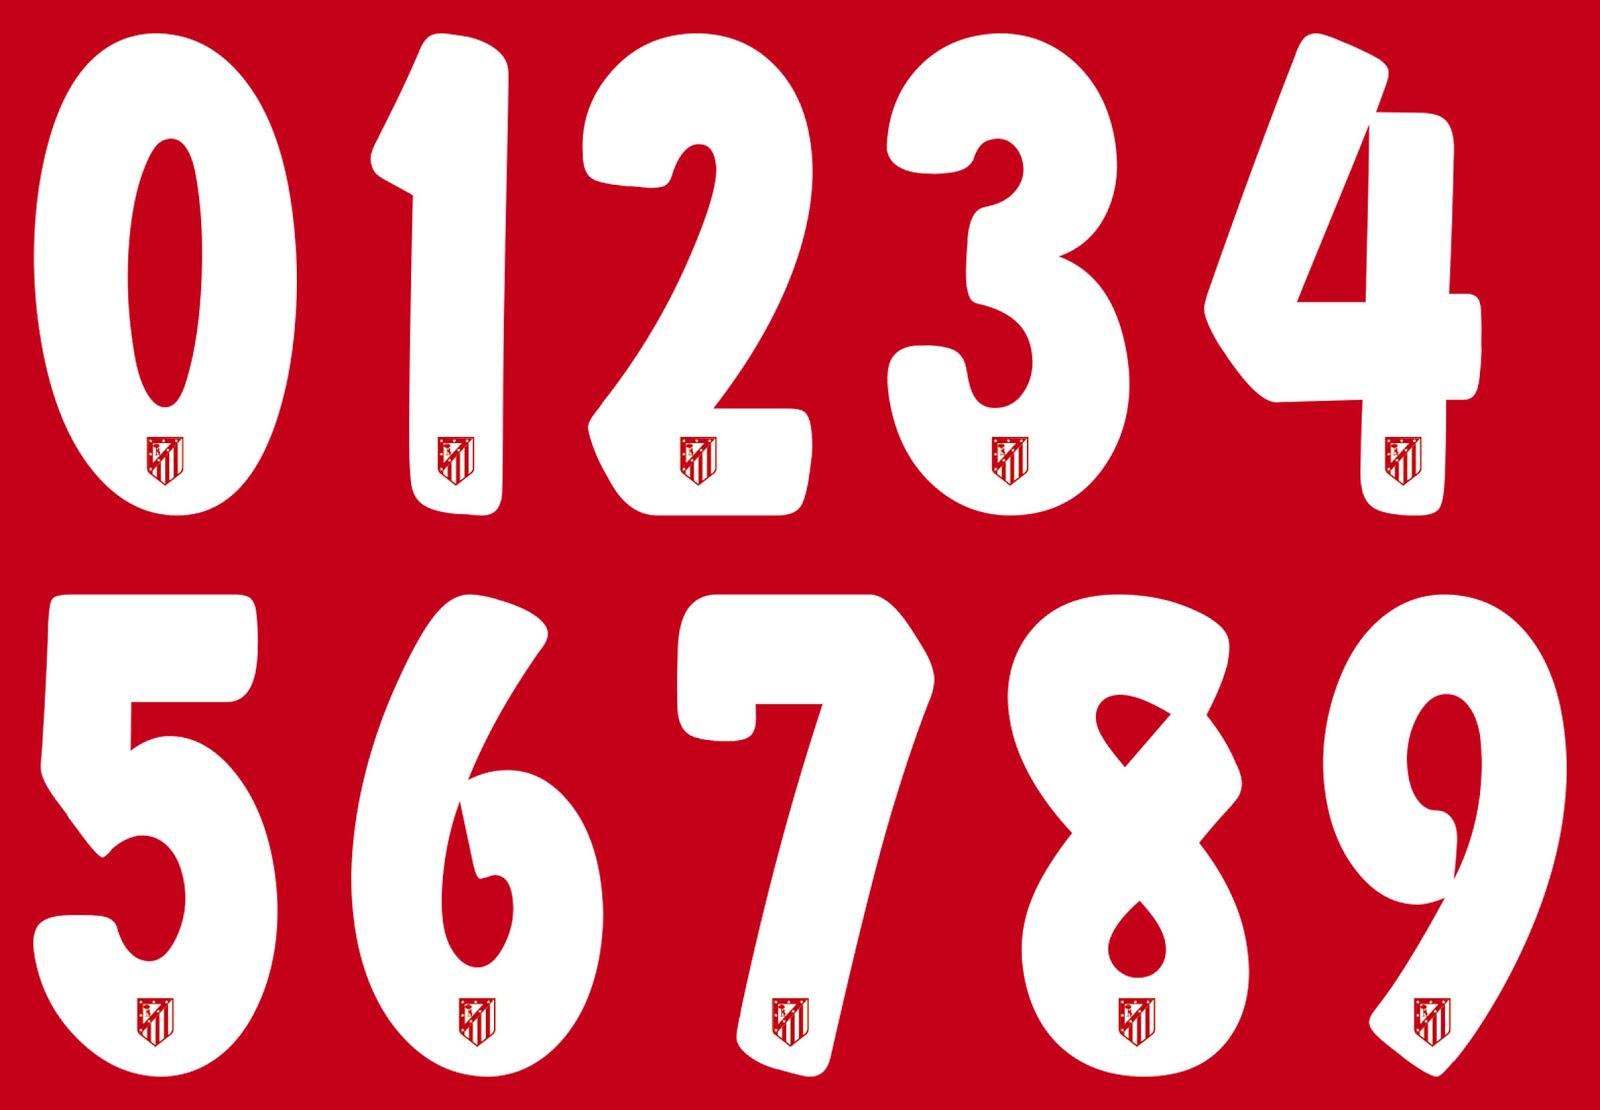 atl 233 tico madrid reveal new font for 15 16 kits footy headlines